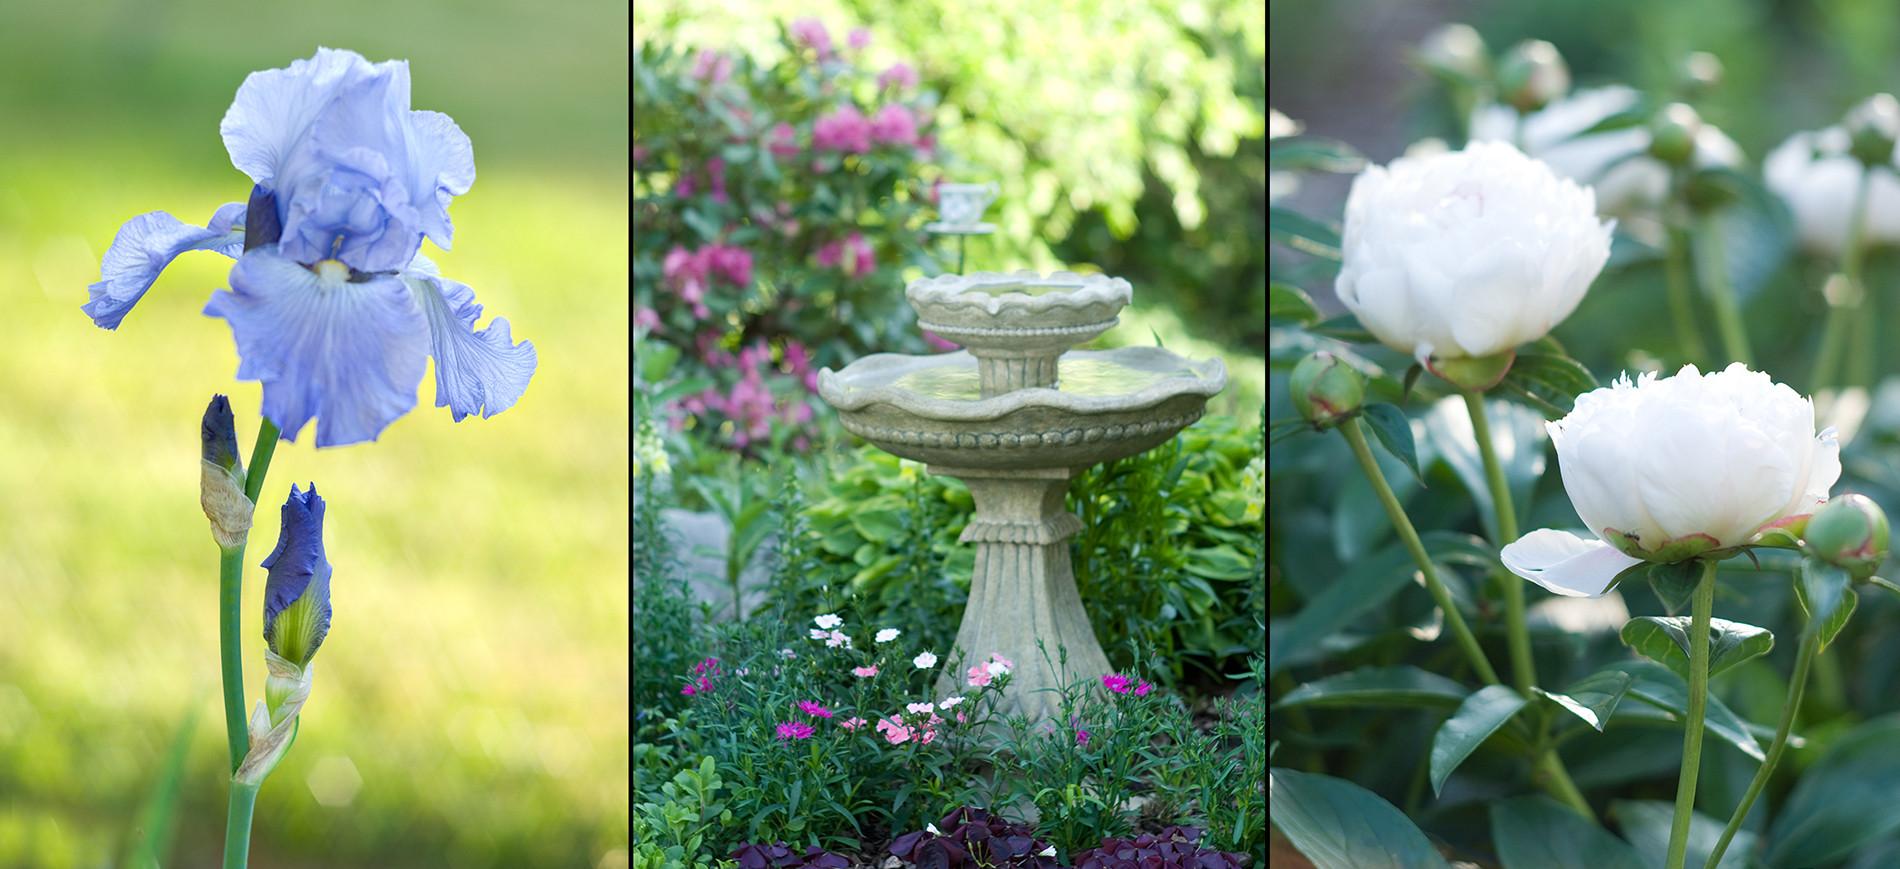 collage of blue iris, fountain in garden, white peonies